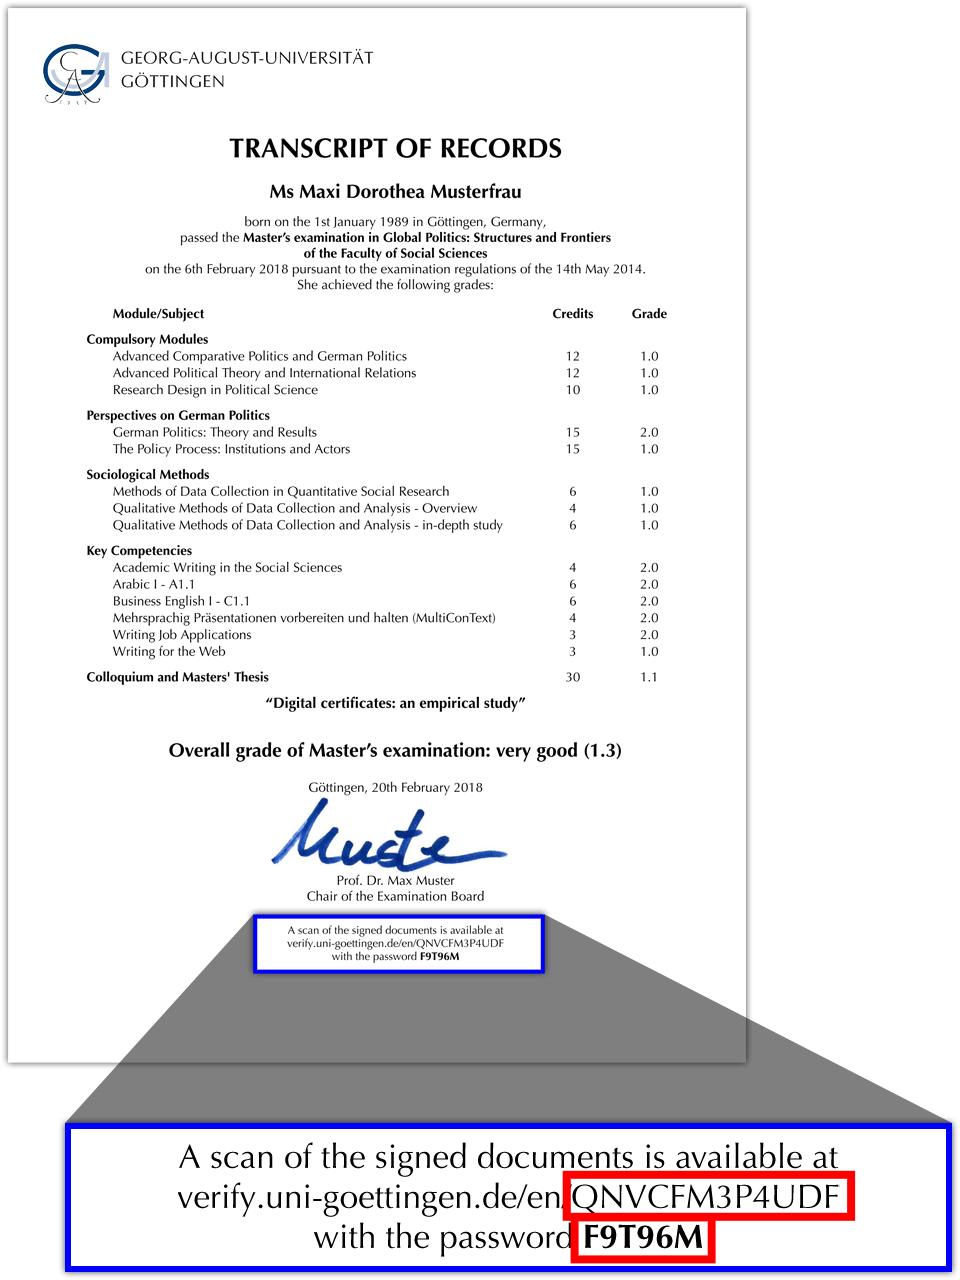 Verification Of Transcript Of Records Georg August Universitt